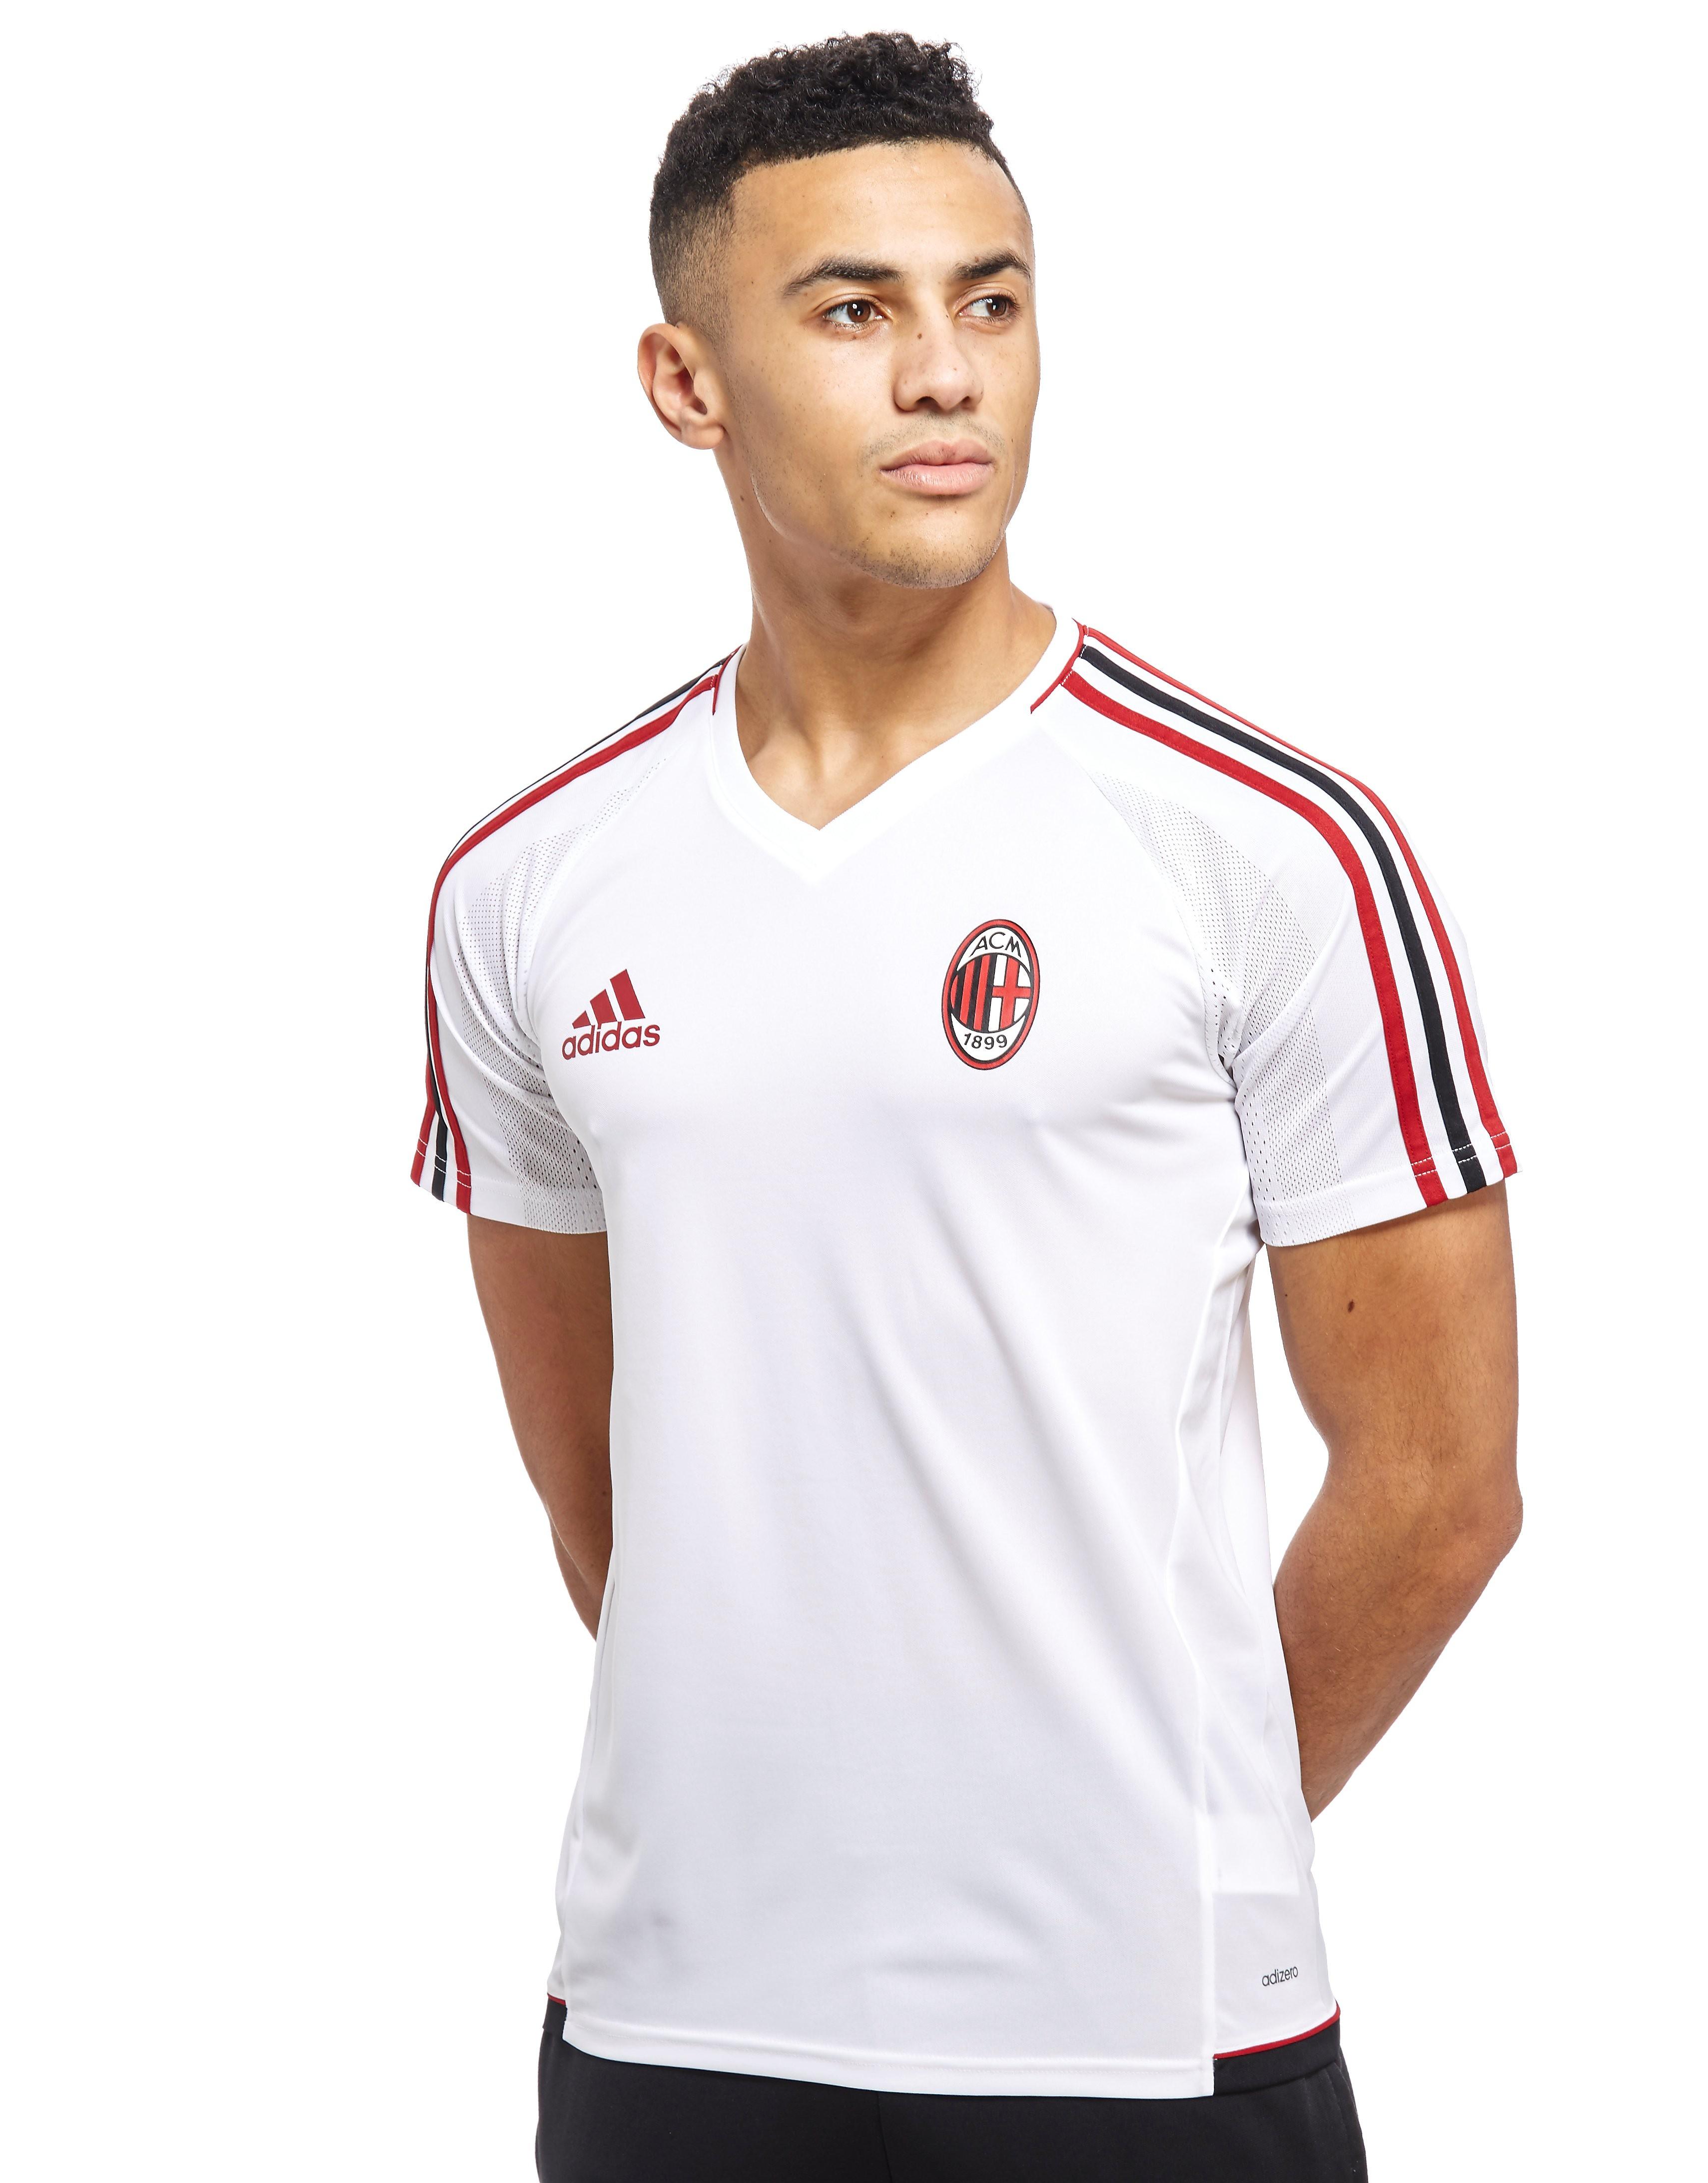 adidas AC Milan 2017/18 Training Shirt